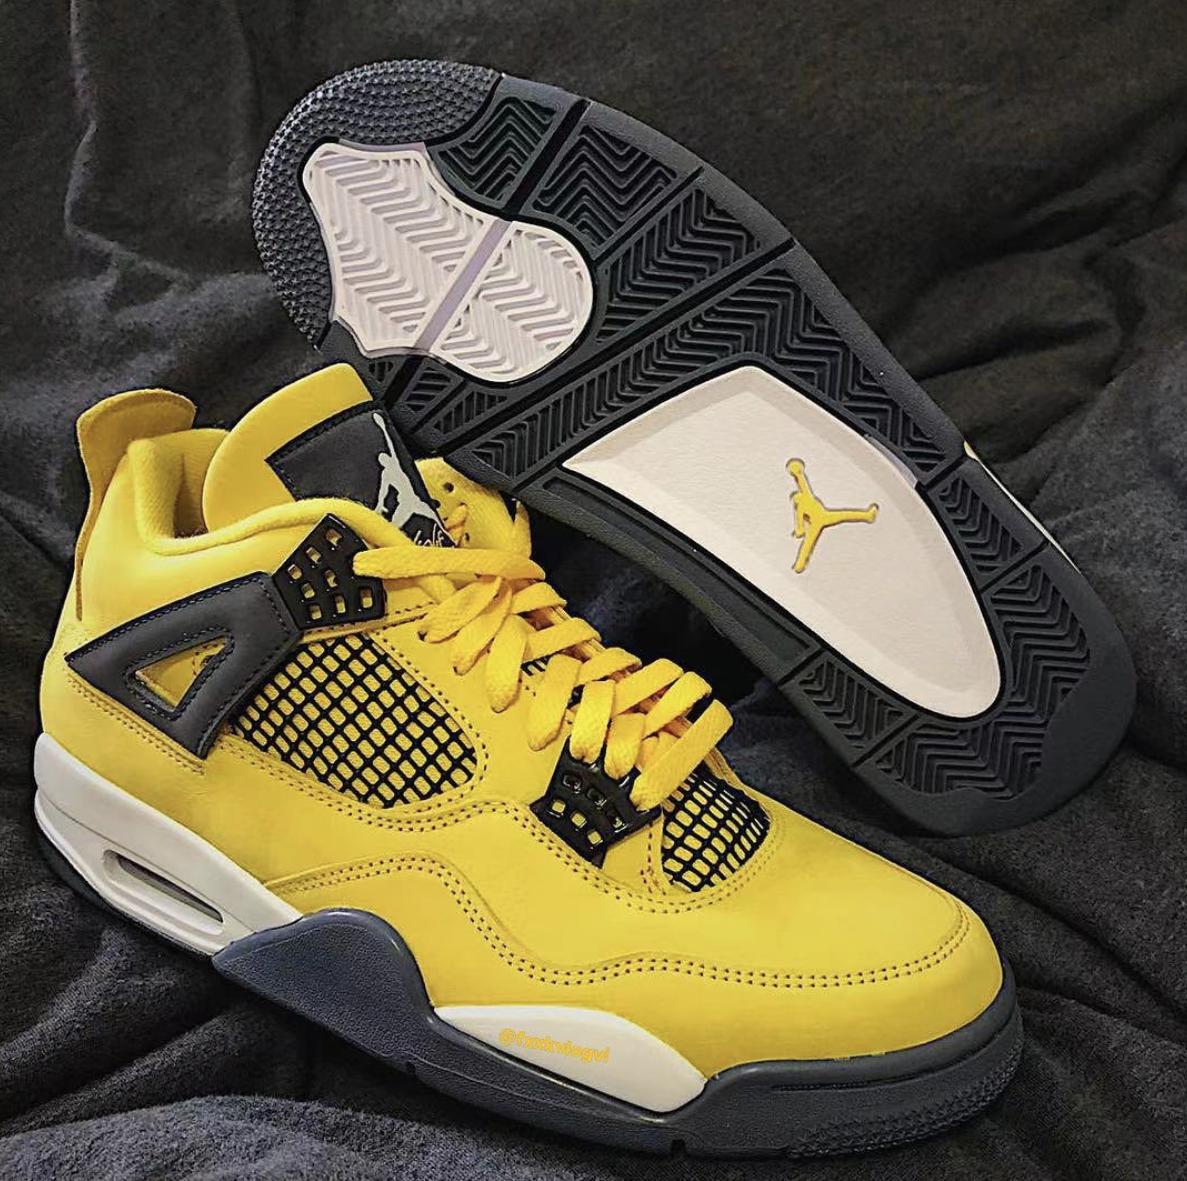 Air Jordan 4 Lightning Tour Yellow CT8527-700 Release Date